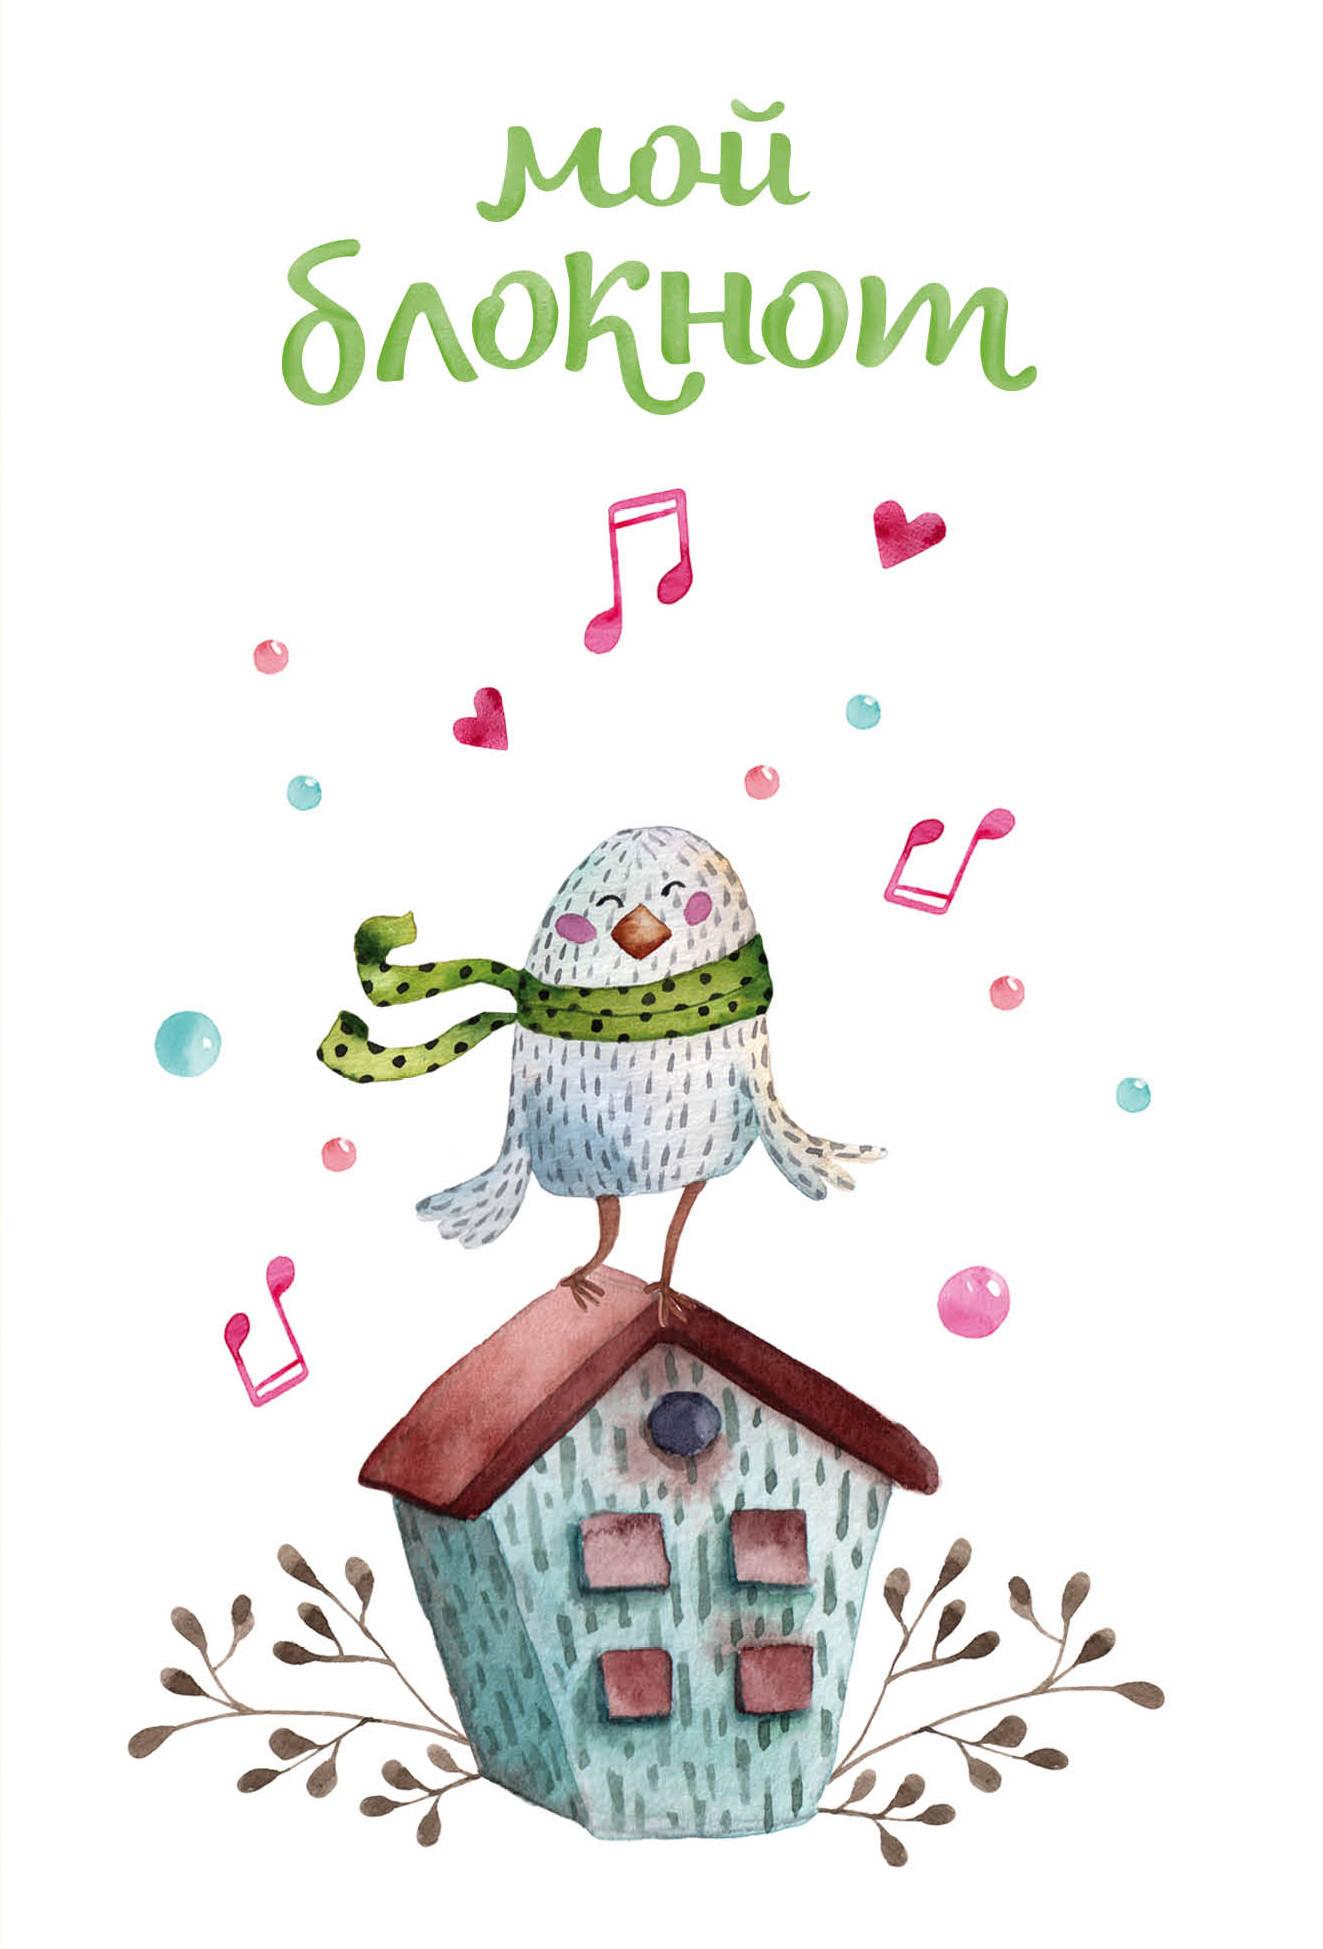 М. А. Ступак Певчие птички от @mashamashastu. Мой блокнот (зеленый) м а ступак певчие птички от mashamashastu мой блокнот зеленый